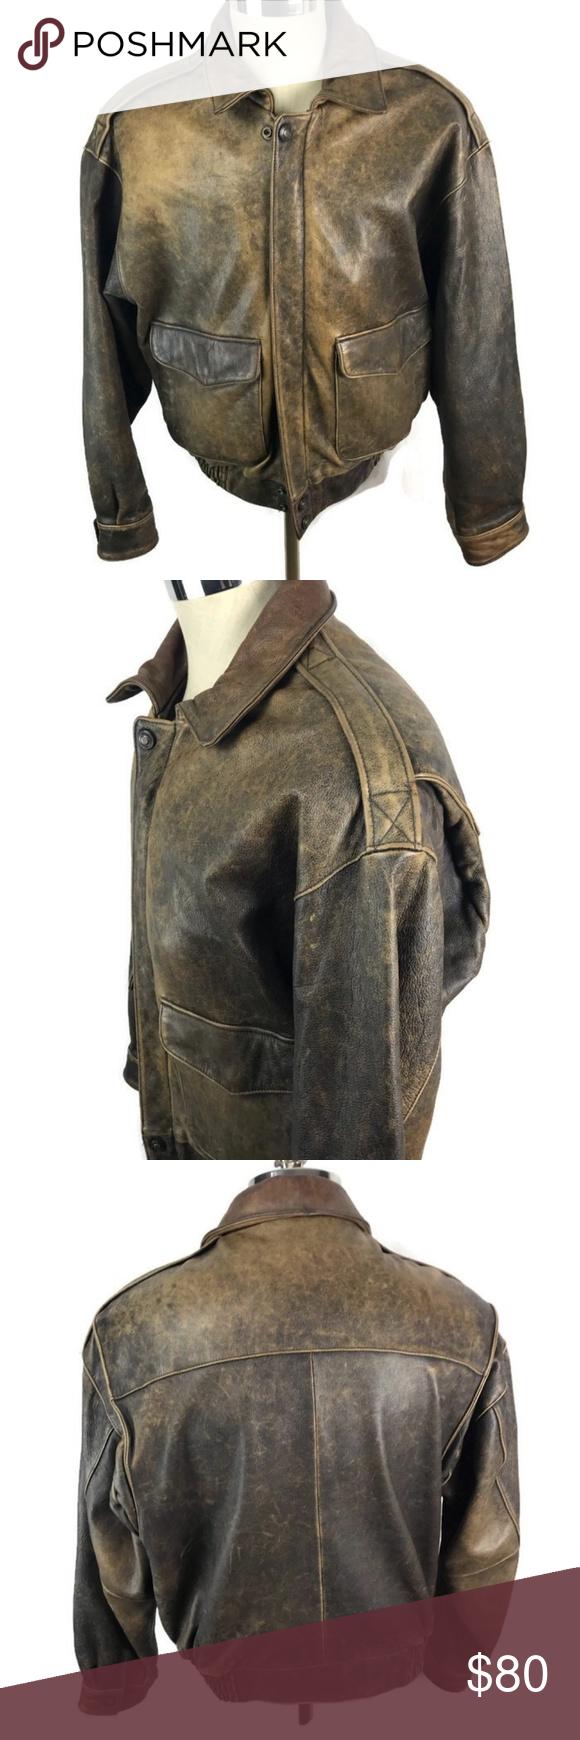 Wilson Bomber Leather Jacket Motorcycle Adventure Vintage